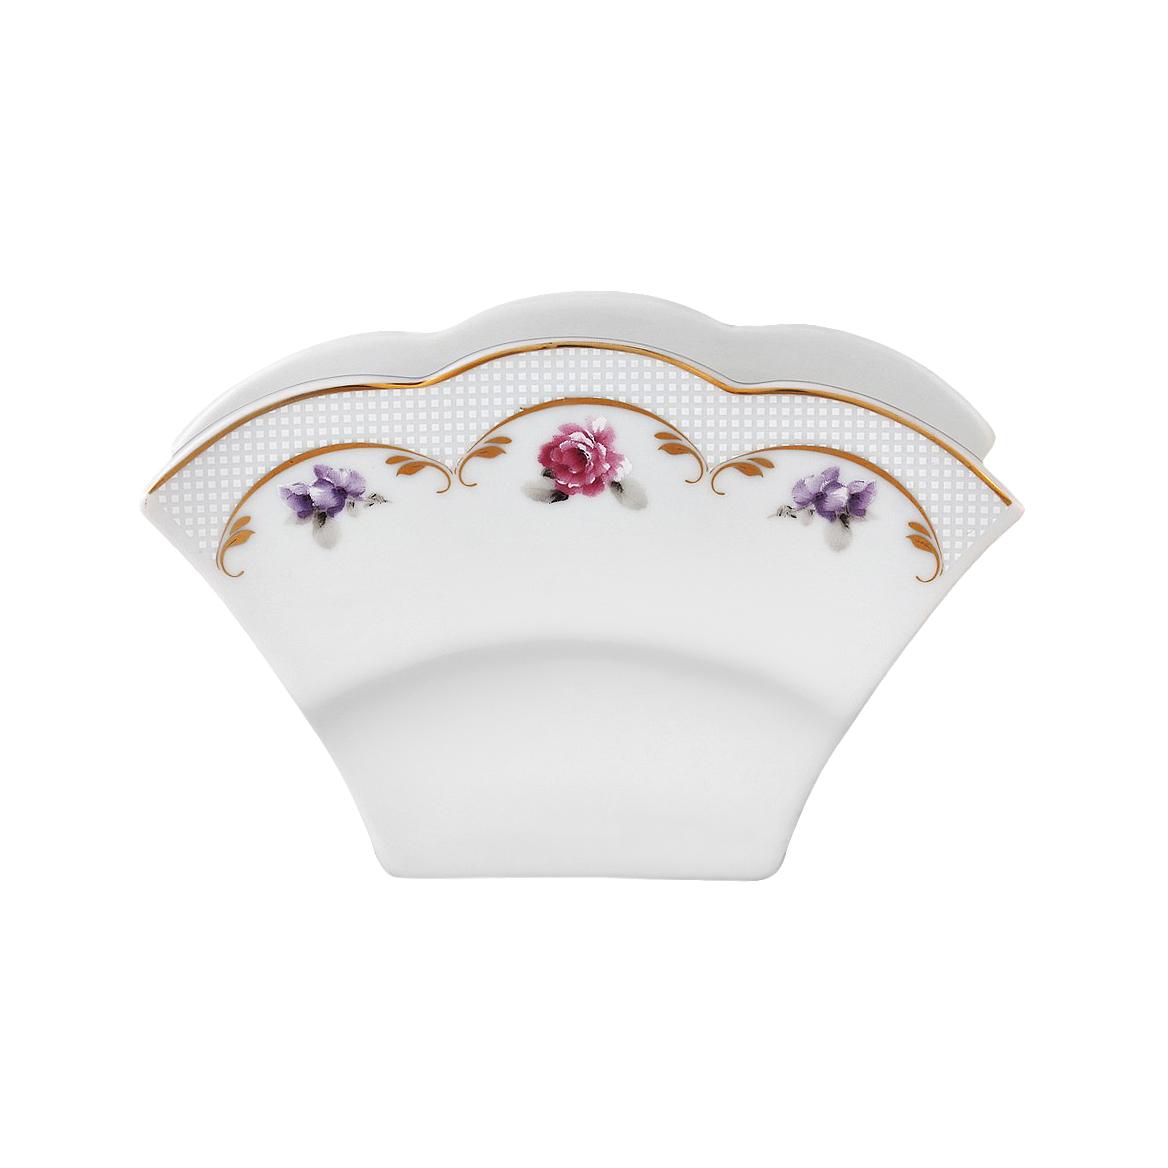 Салфетник Kutahya porselen Nilda декор 8576 фото